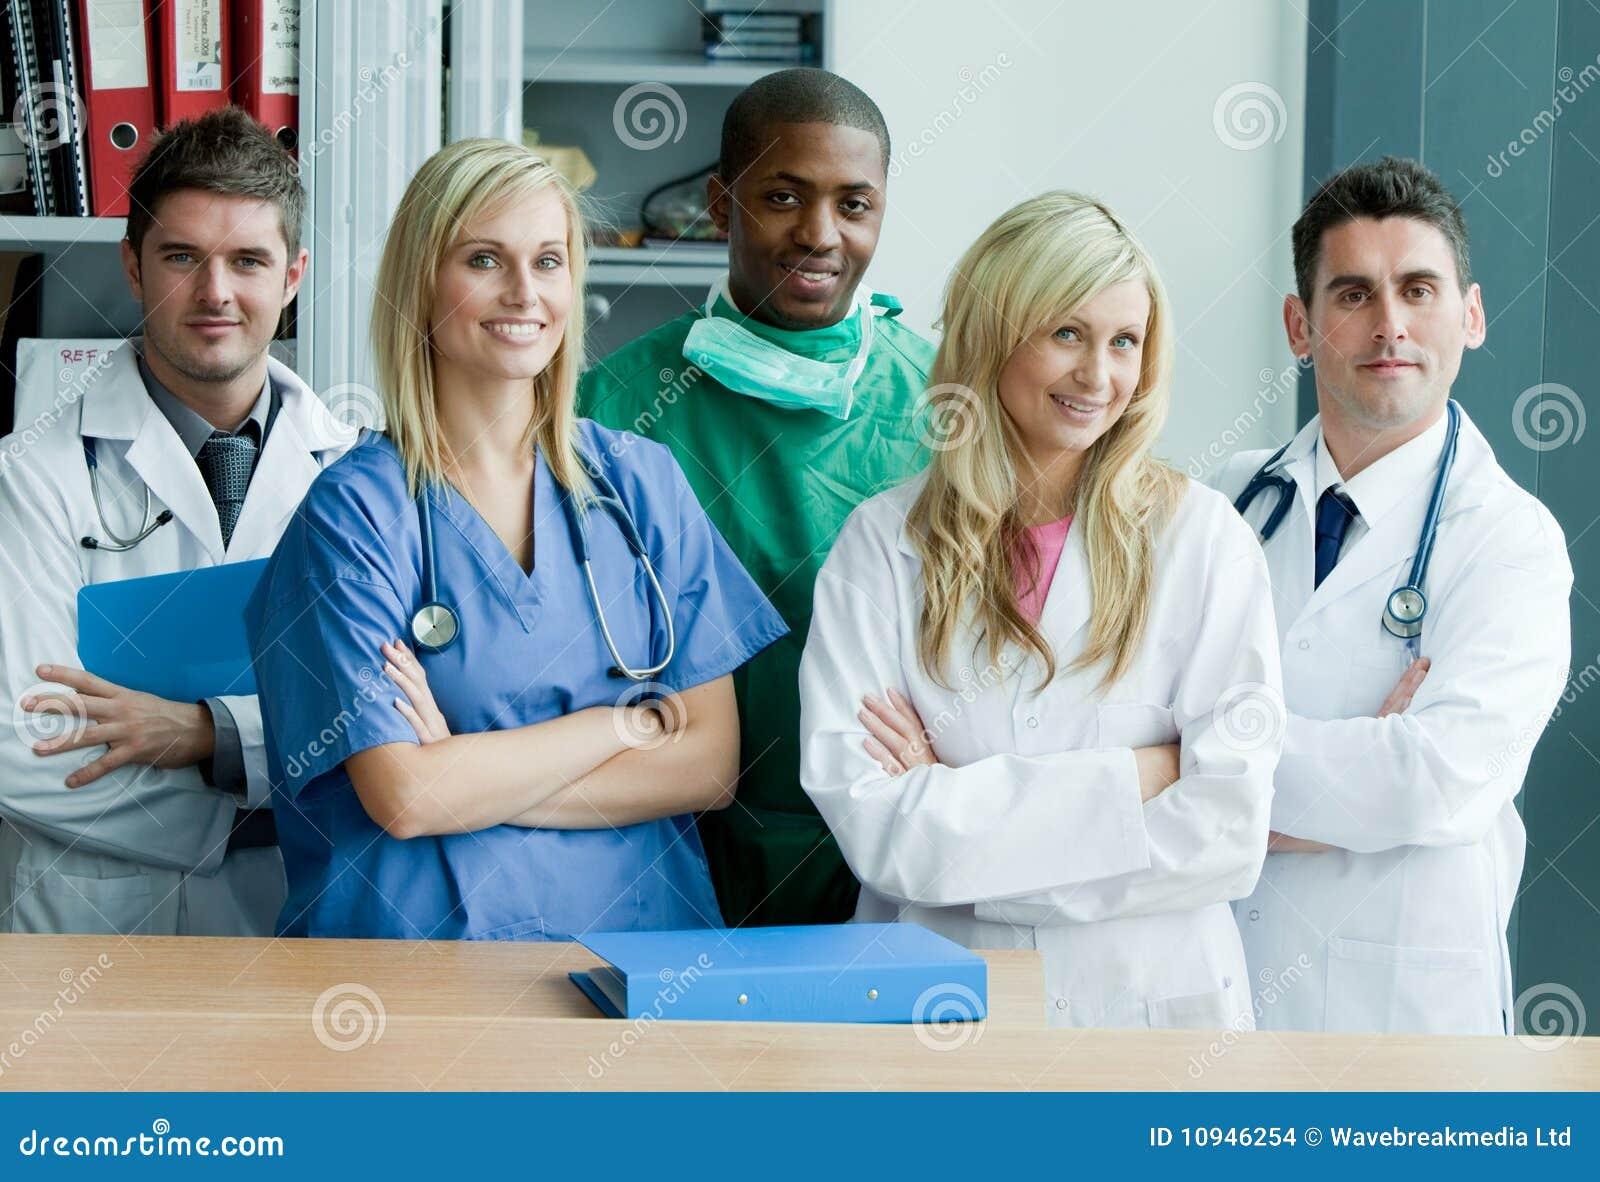 Hospital team work